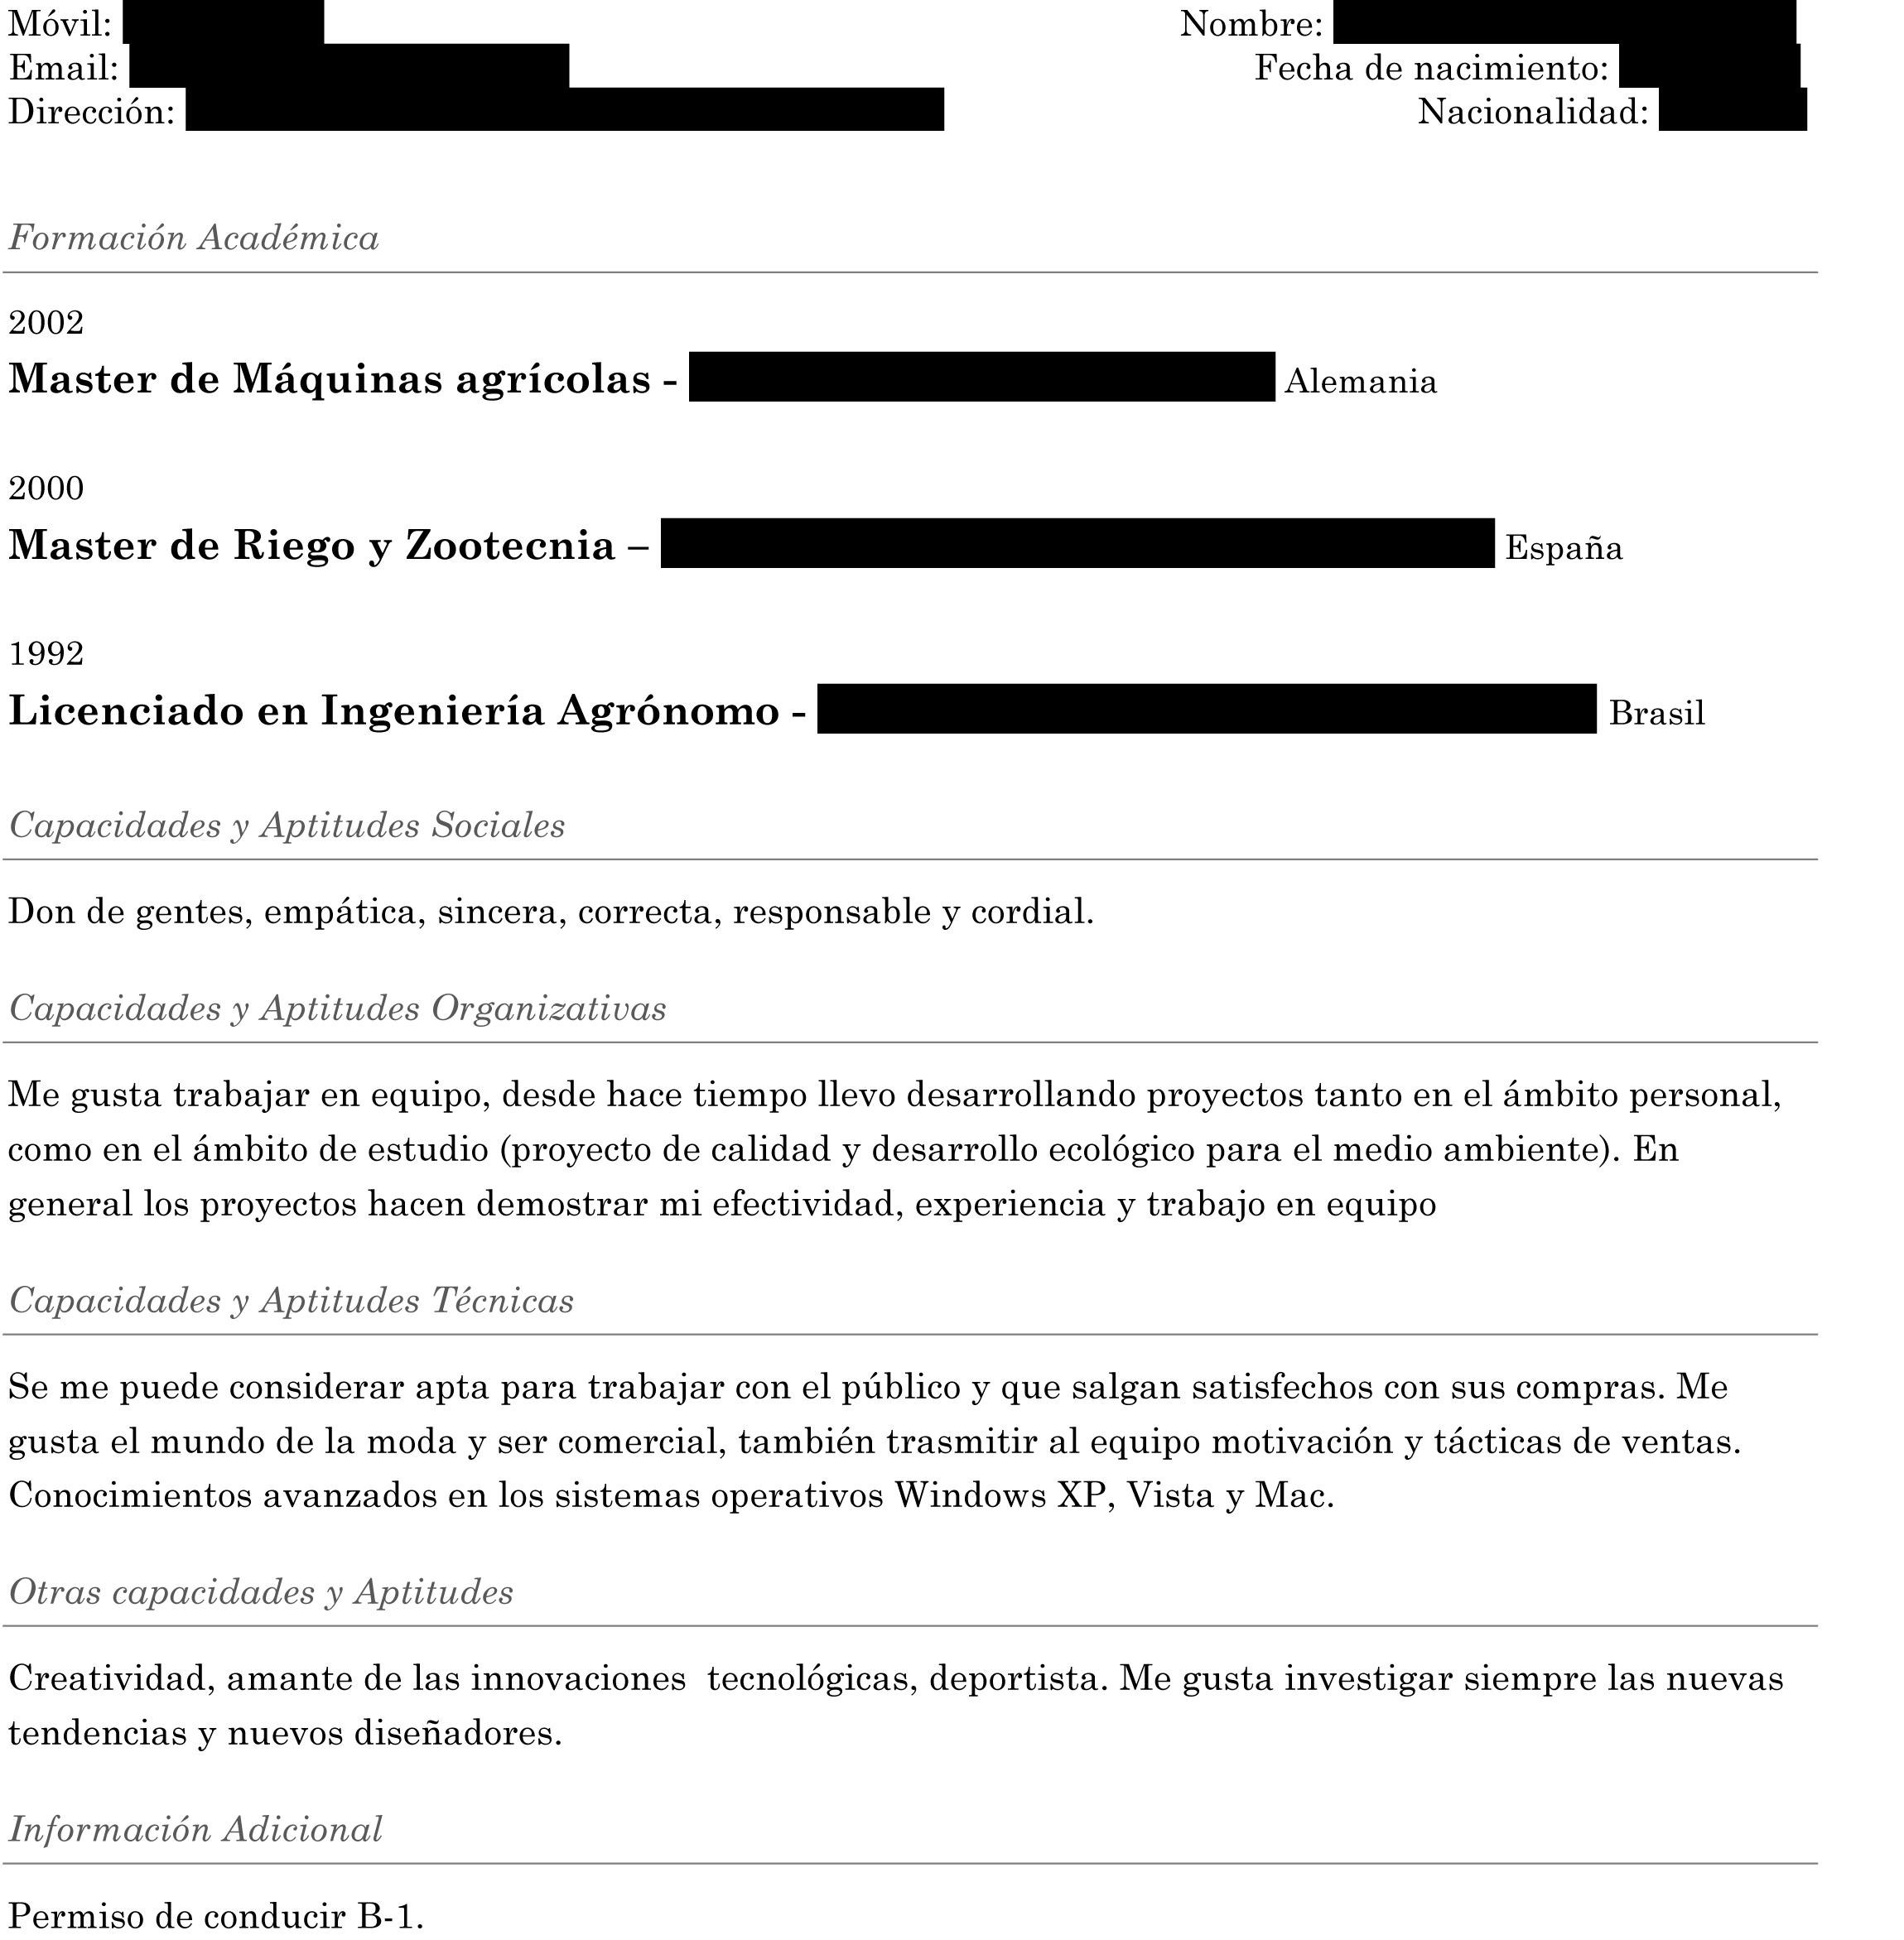 Resume latex template